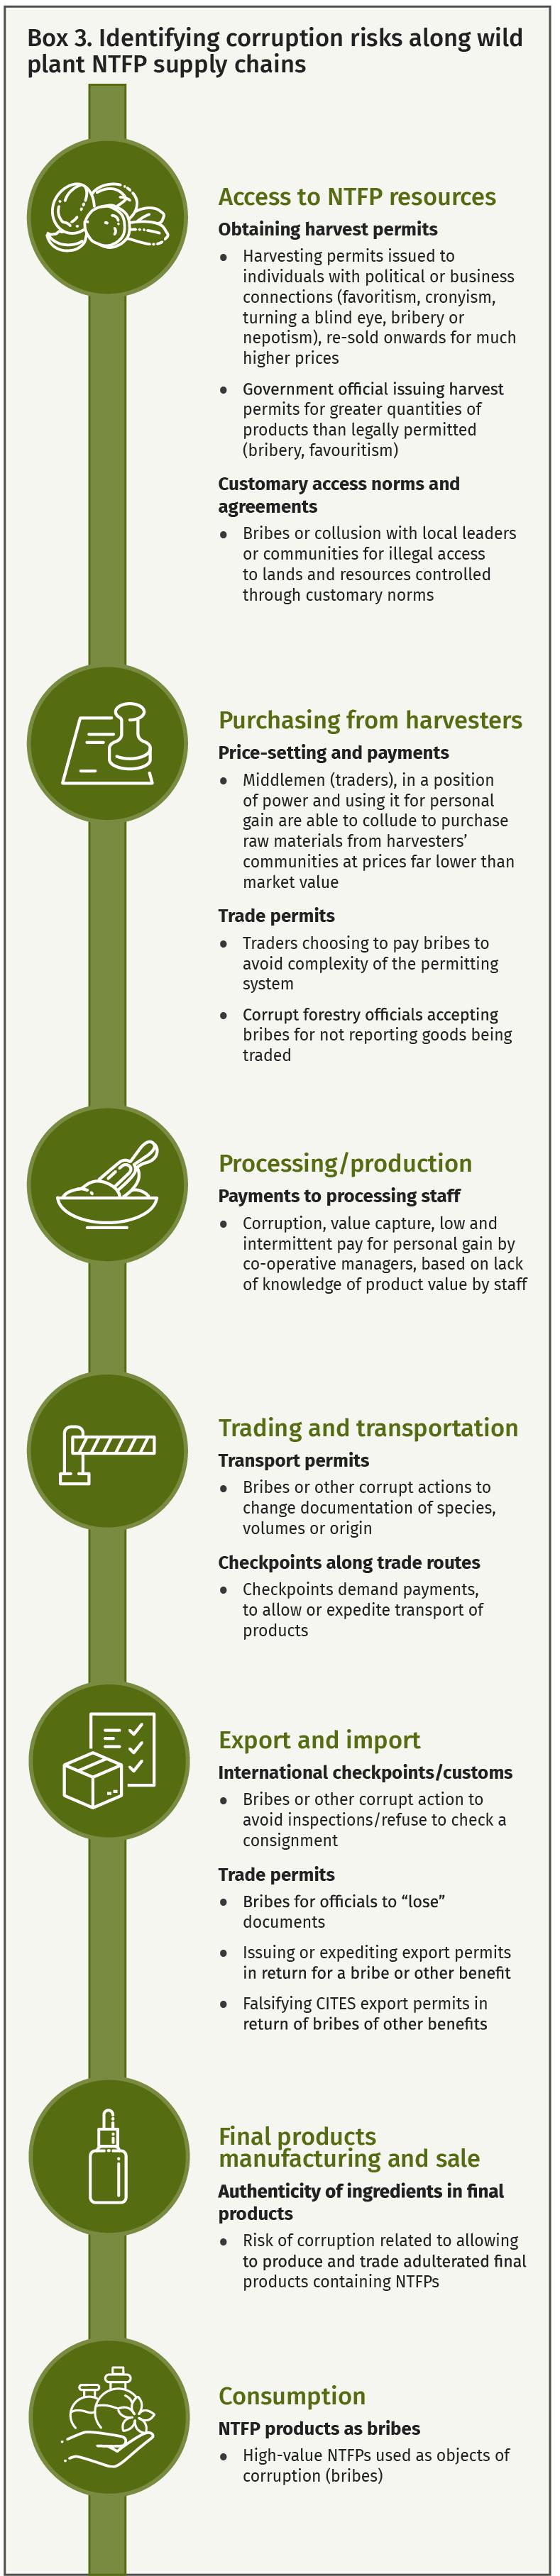 Box 3. Identifying corruption risks along wild plant NTFP supply chains